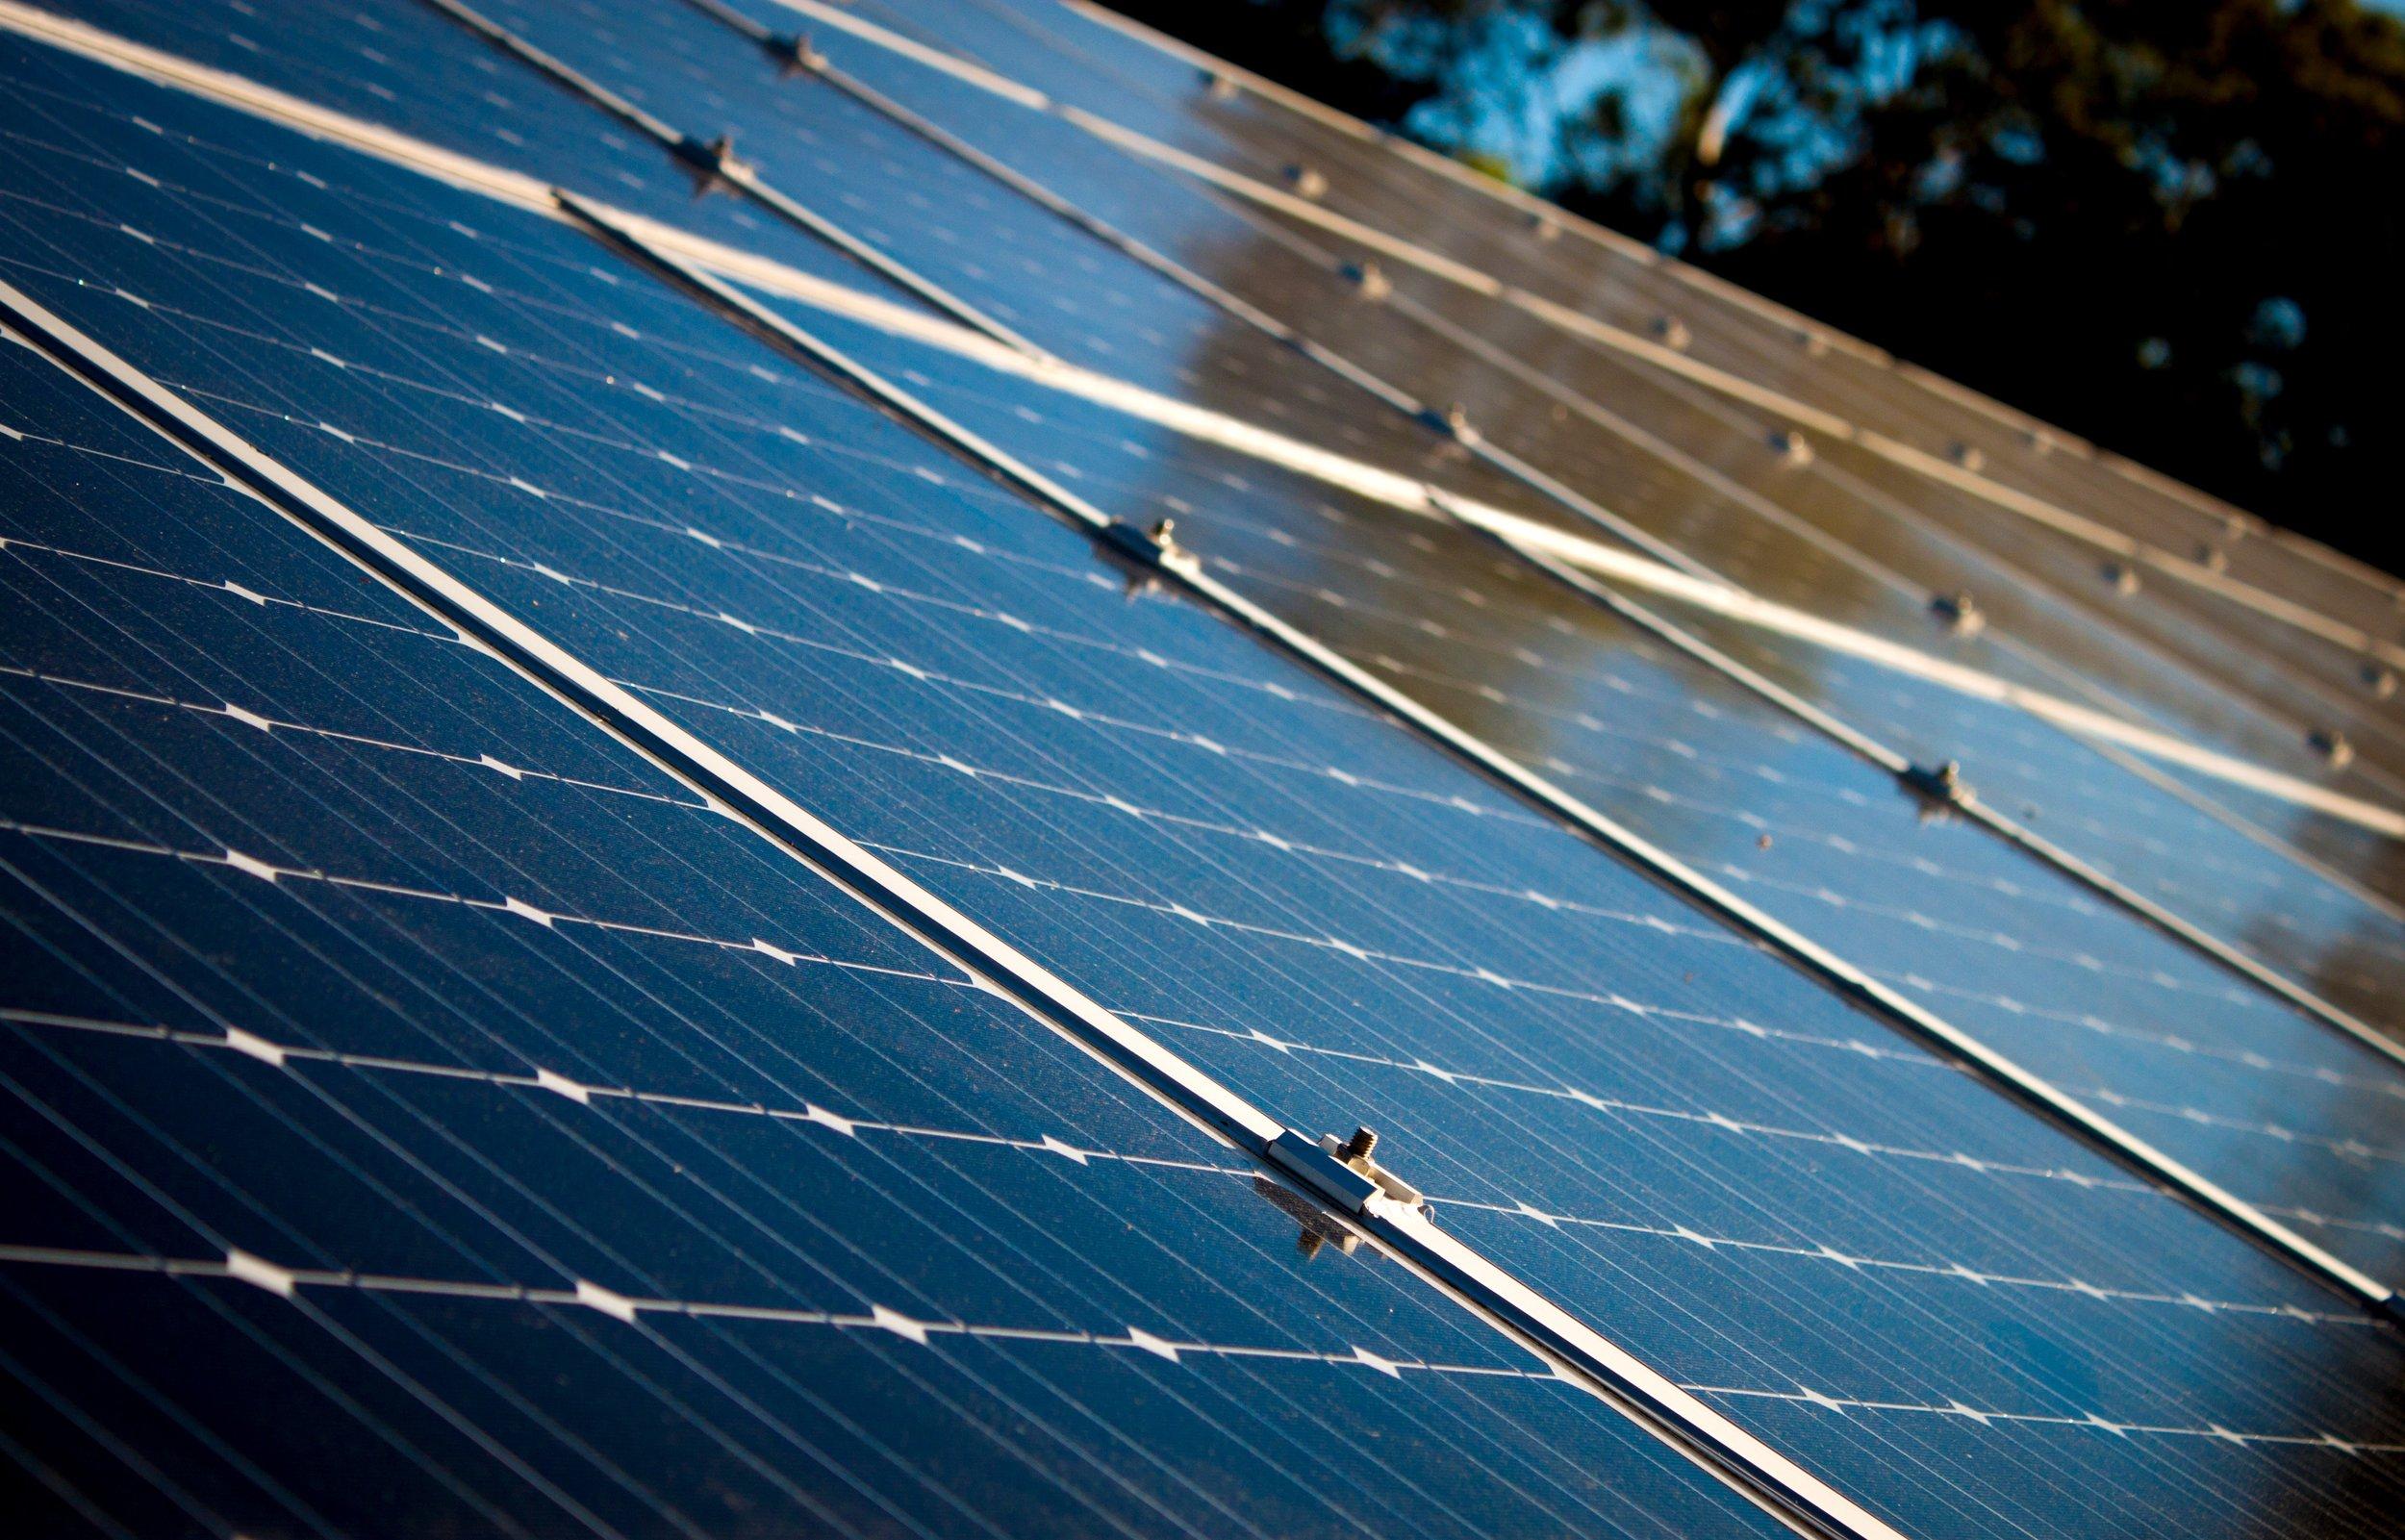 alternative-alternative-energy-clean-energy-421888.jpg